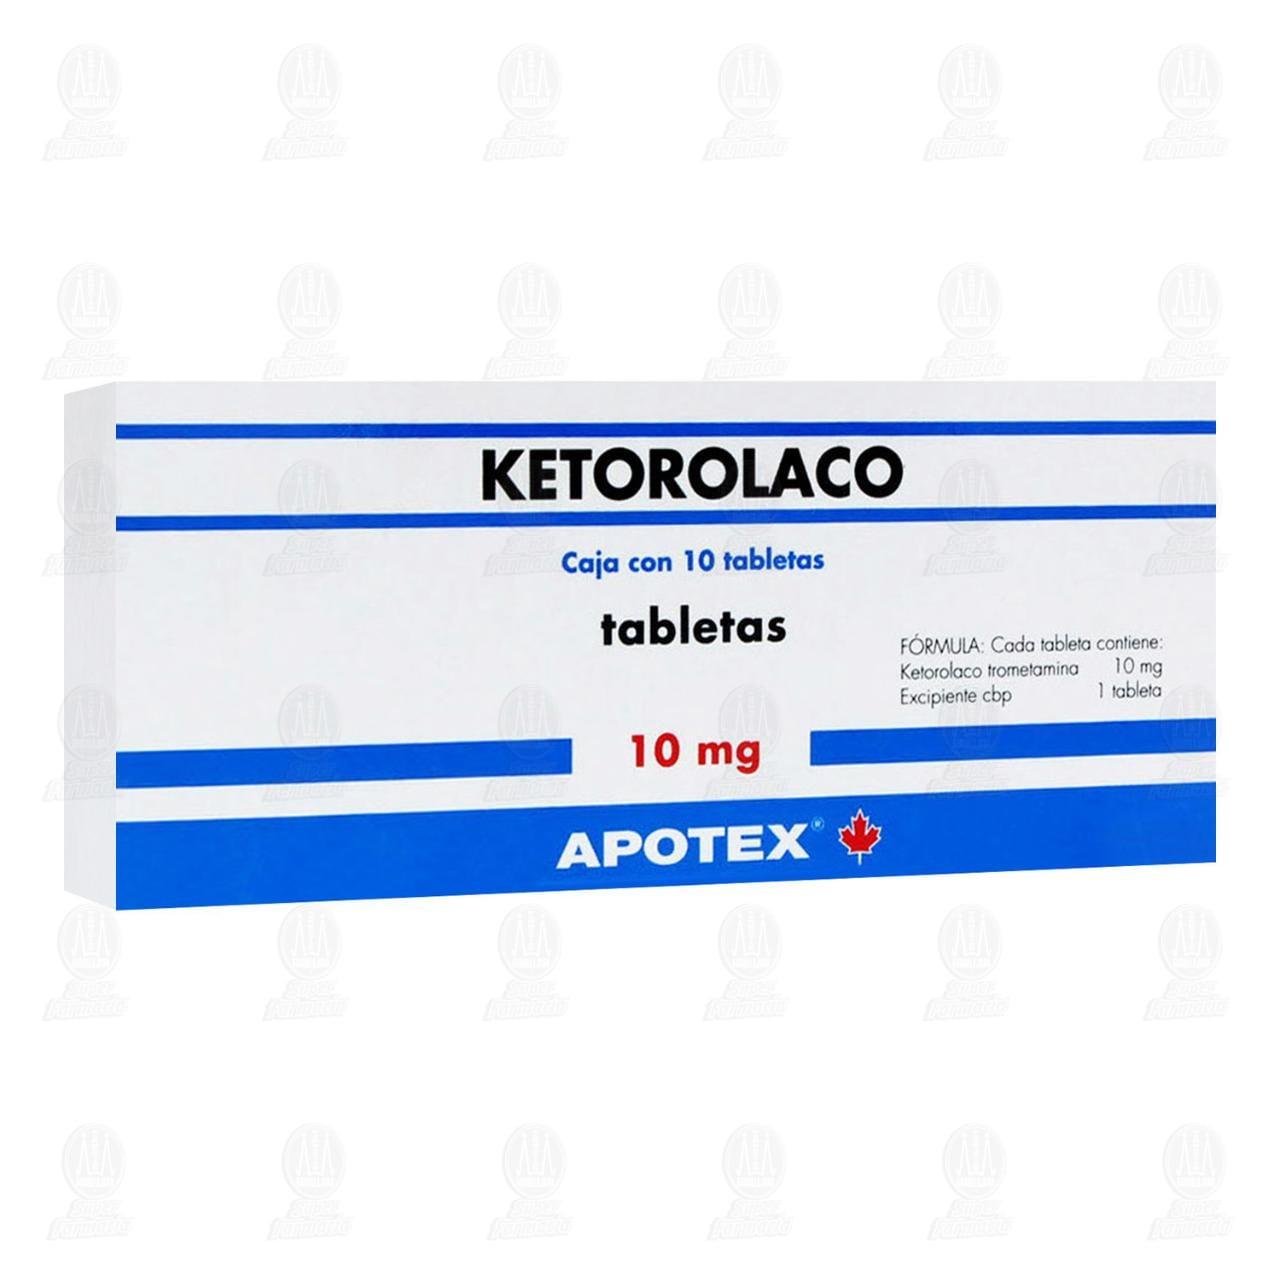 Comprar Ketorolaco 10mg 10 Tabletas en Farmacias Guadalajara